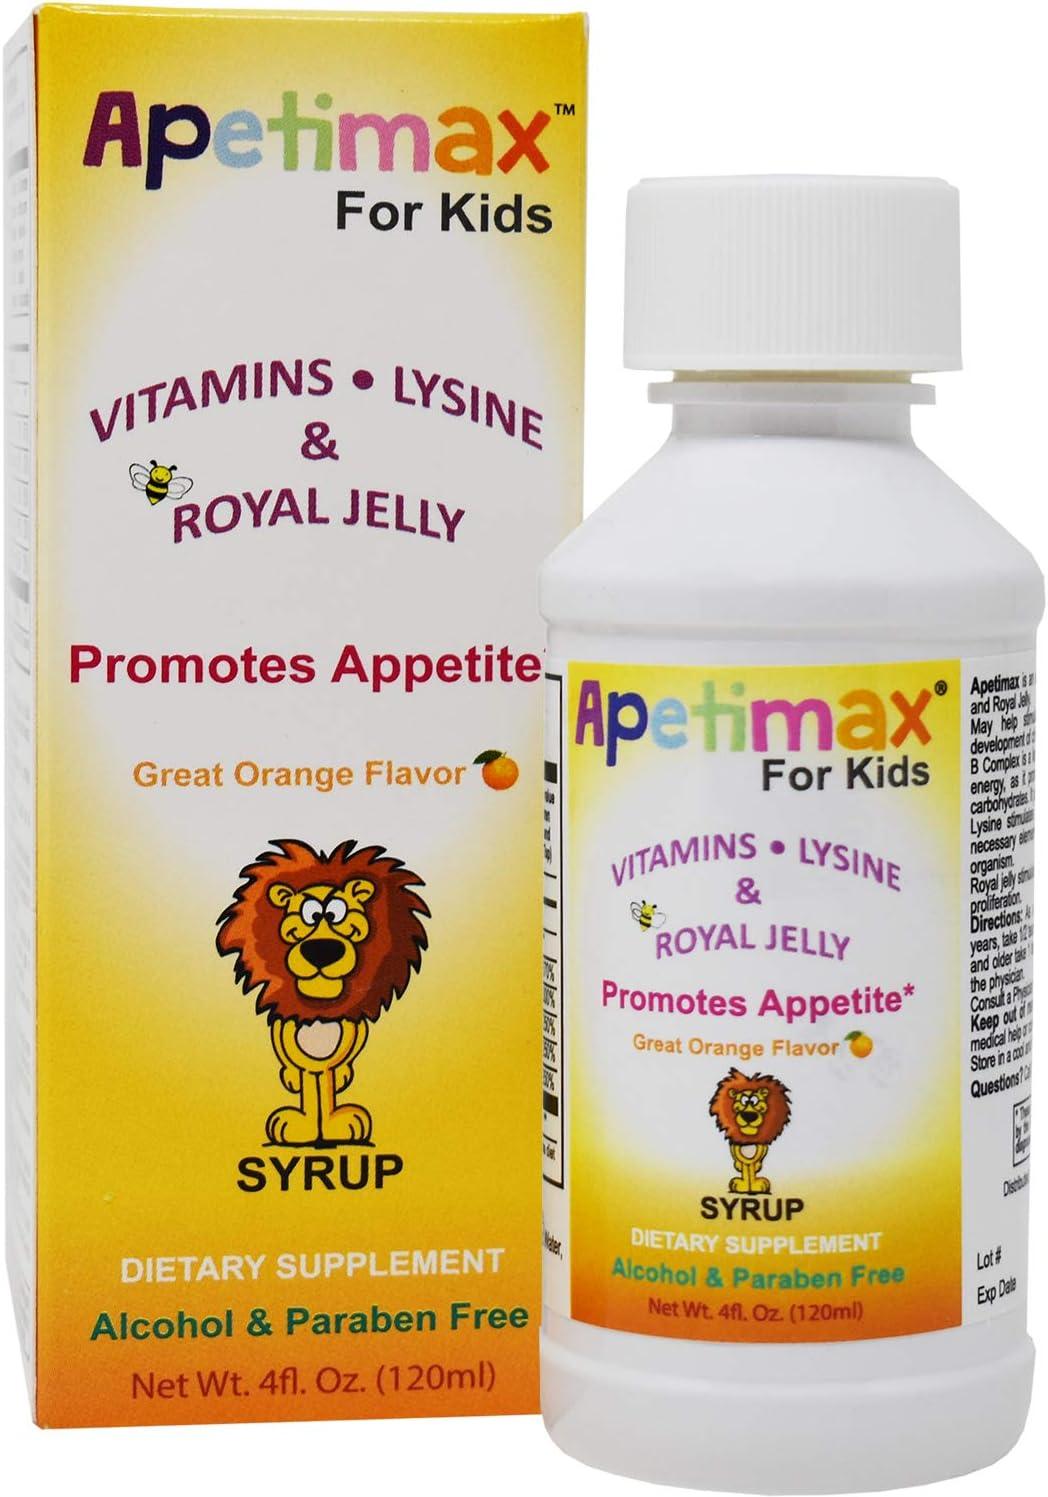 Apetimax for Kids Vitamins Lysine Royal Jelly 4 oz